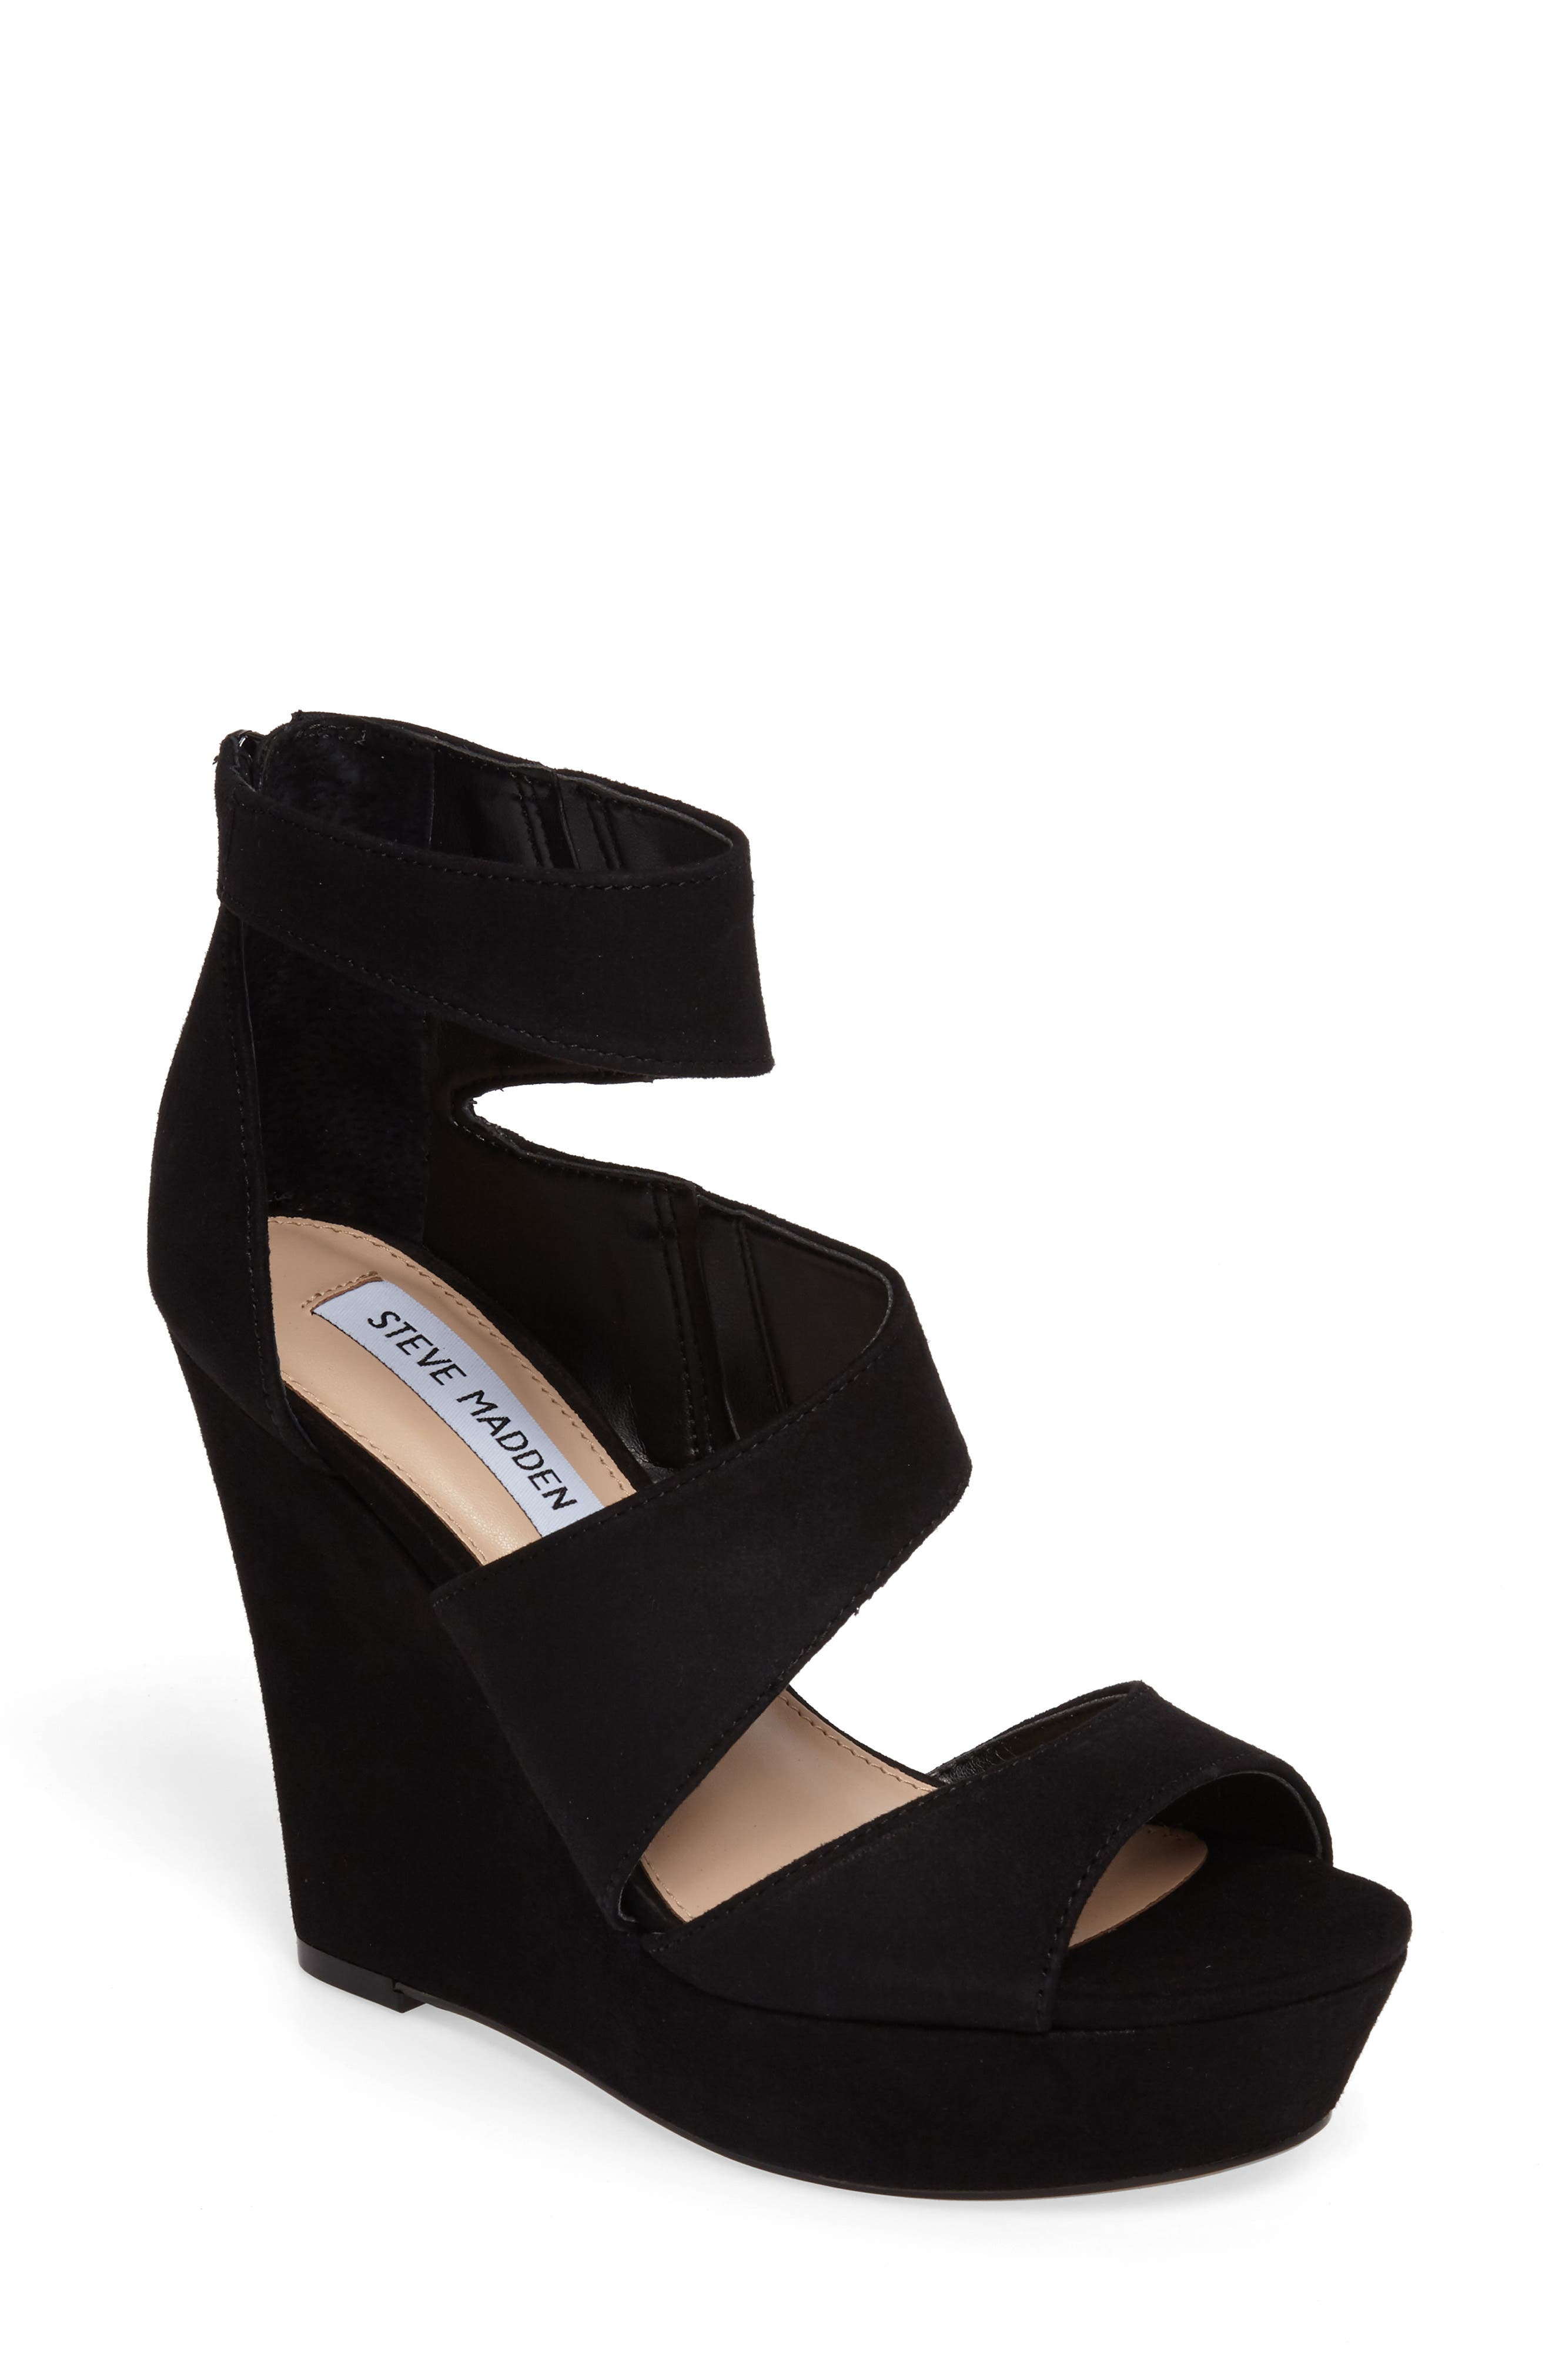 Essey Asymmetrical Platform Wedge Sandal,                             Main thumbnail 1, color,                             006